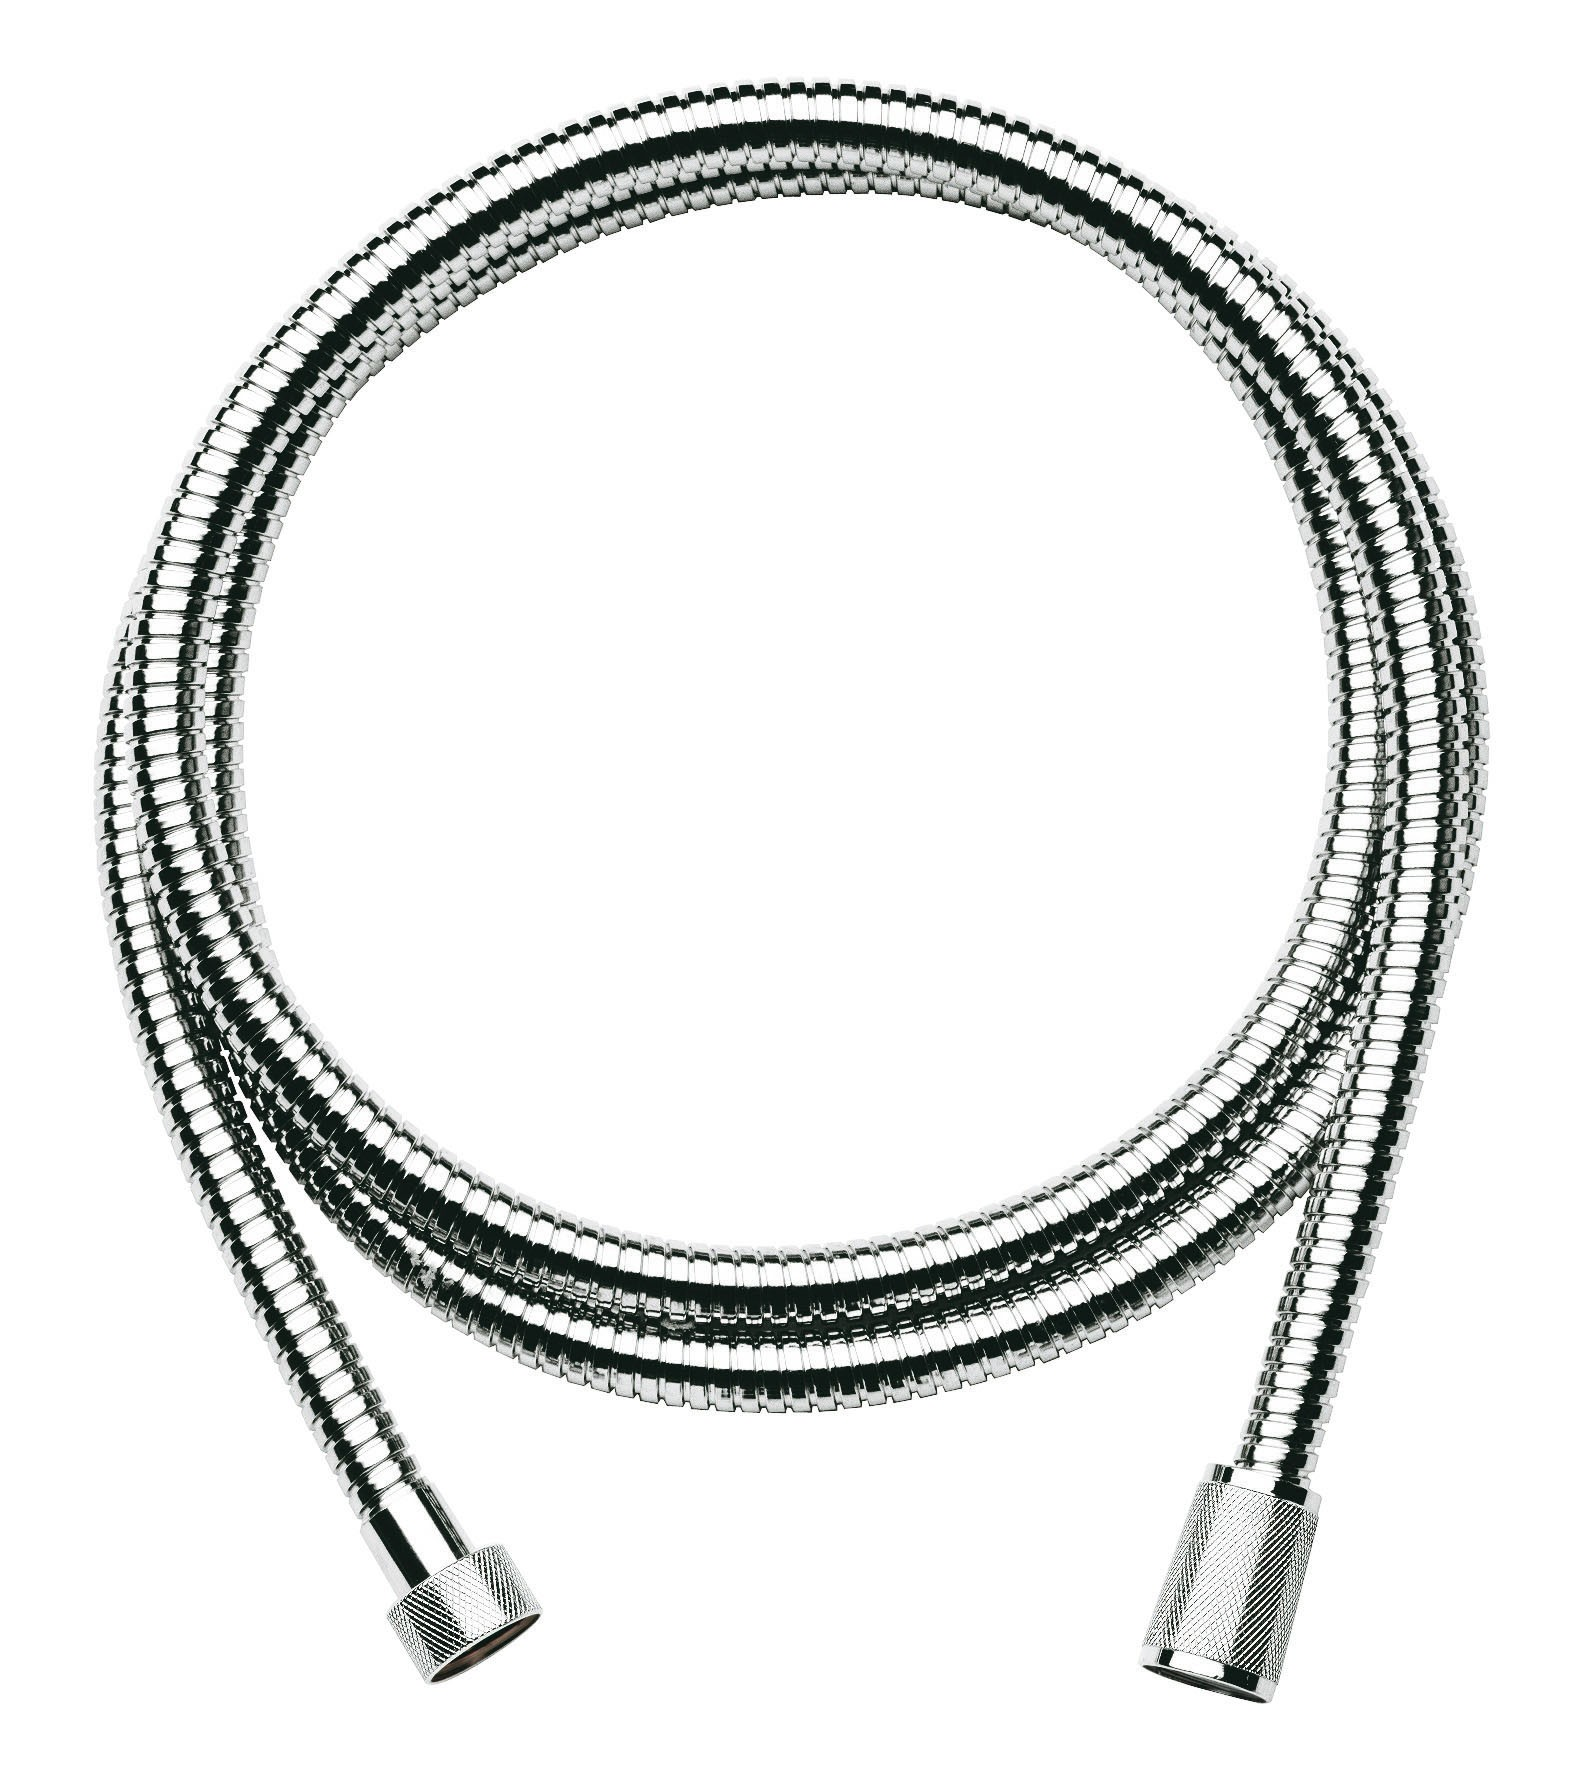 Grohe 28145000 Relexa усиленный (Longlife) 2000 мм, хром